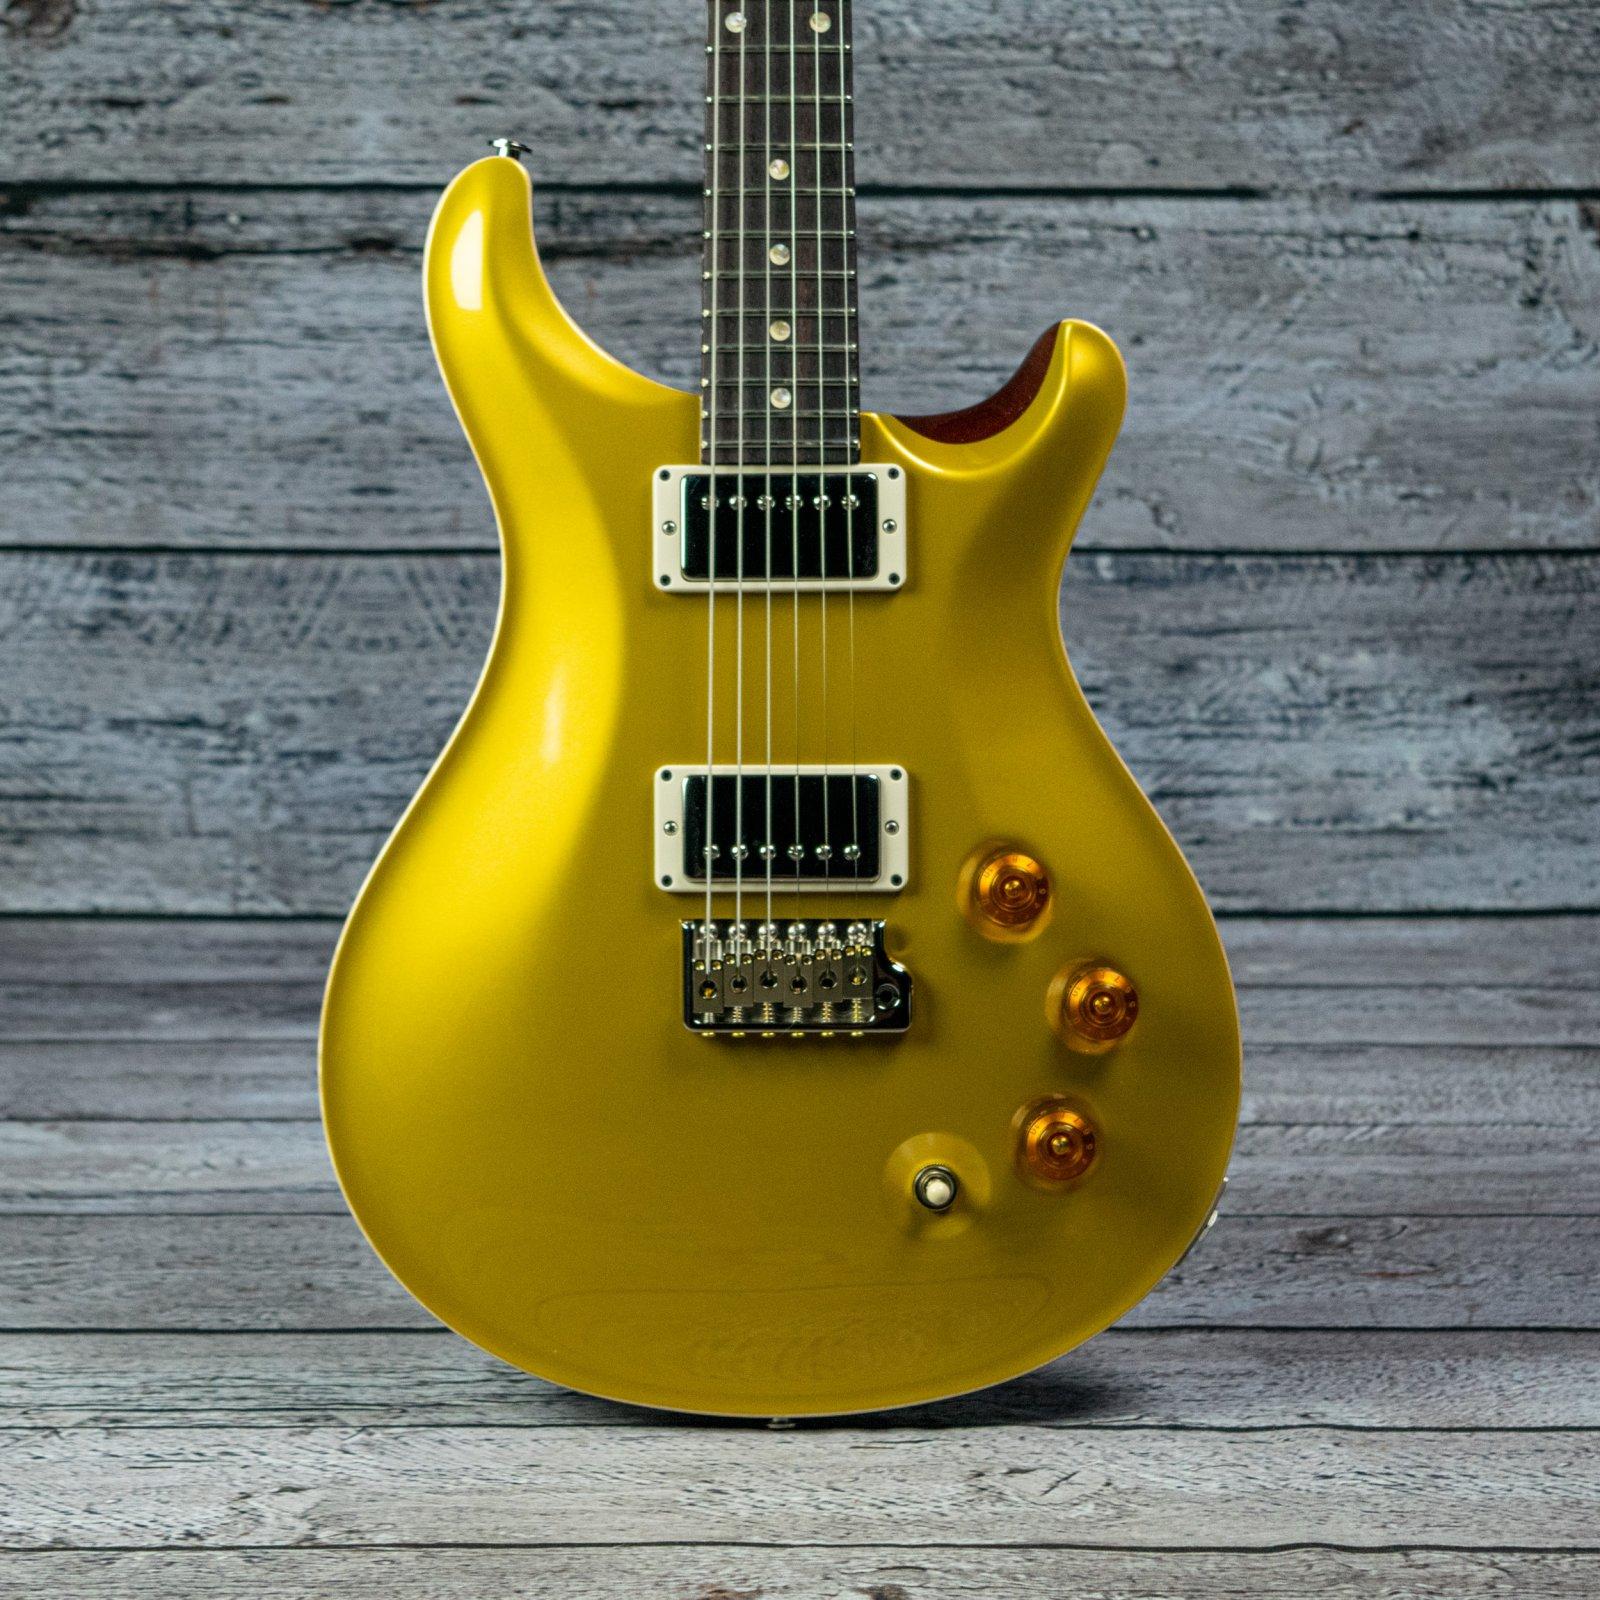 PRS DGT David Grissom Tremolo Electric Guitar - Gold Top